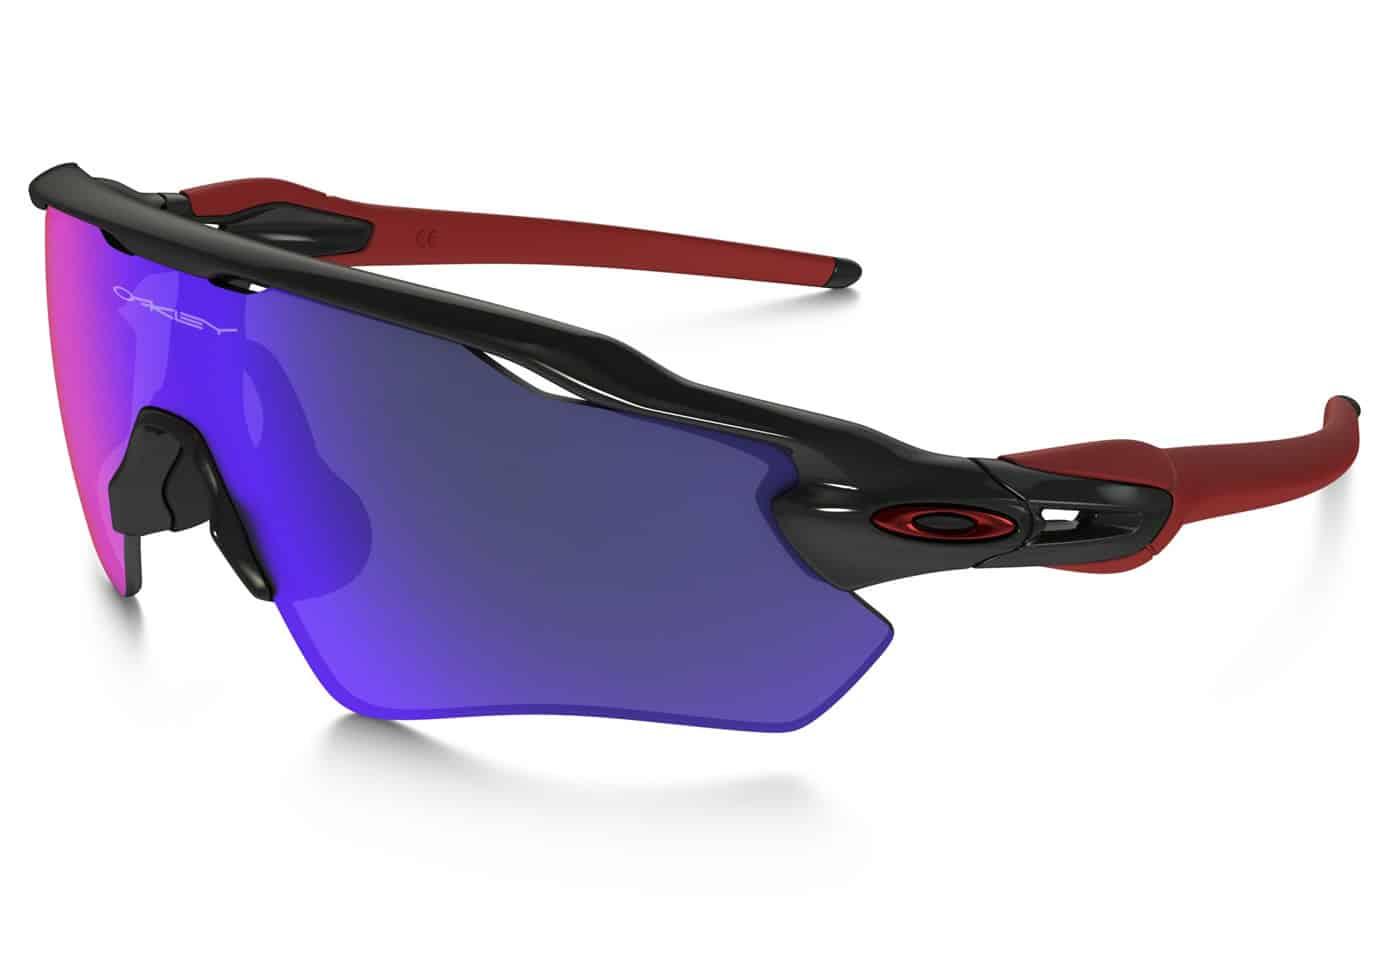 Gafas Oakley RADAR EV PATH rojas